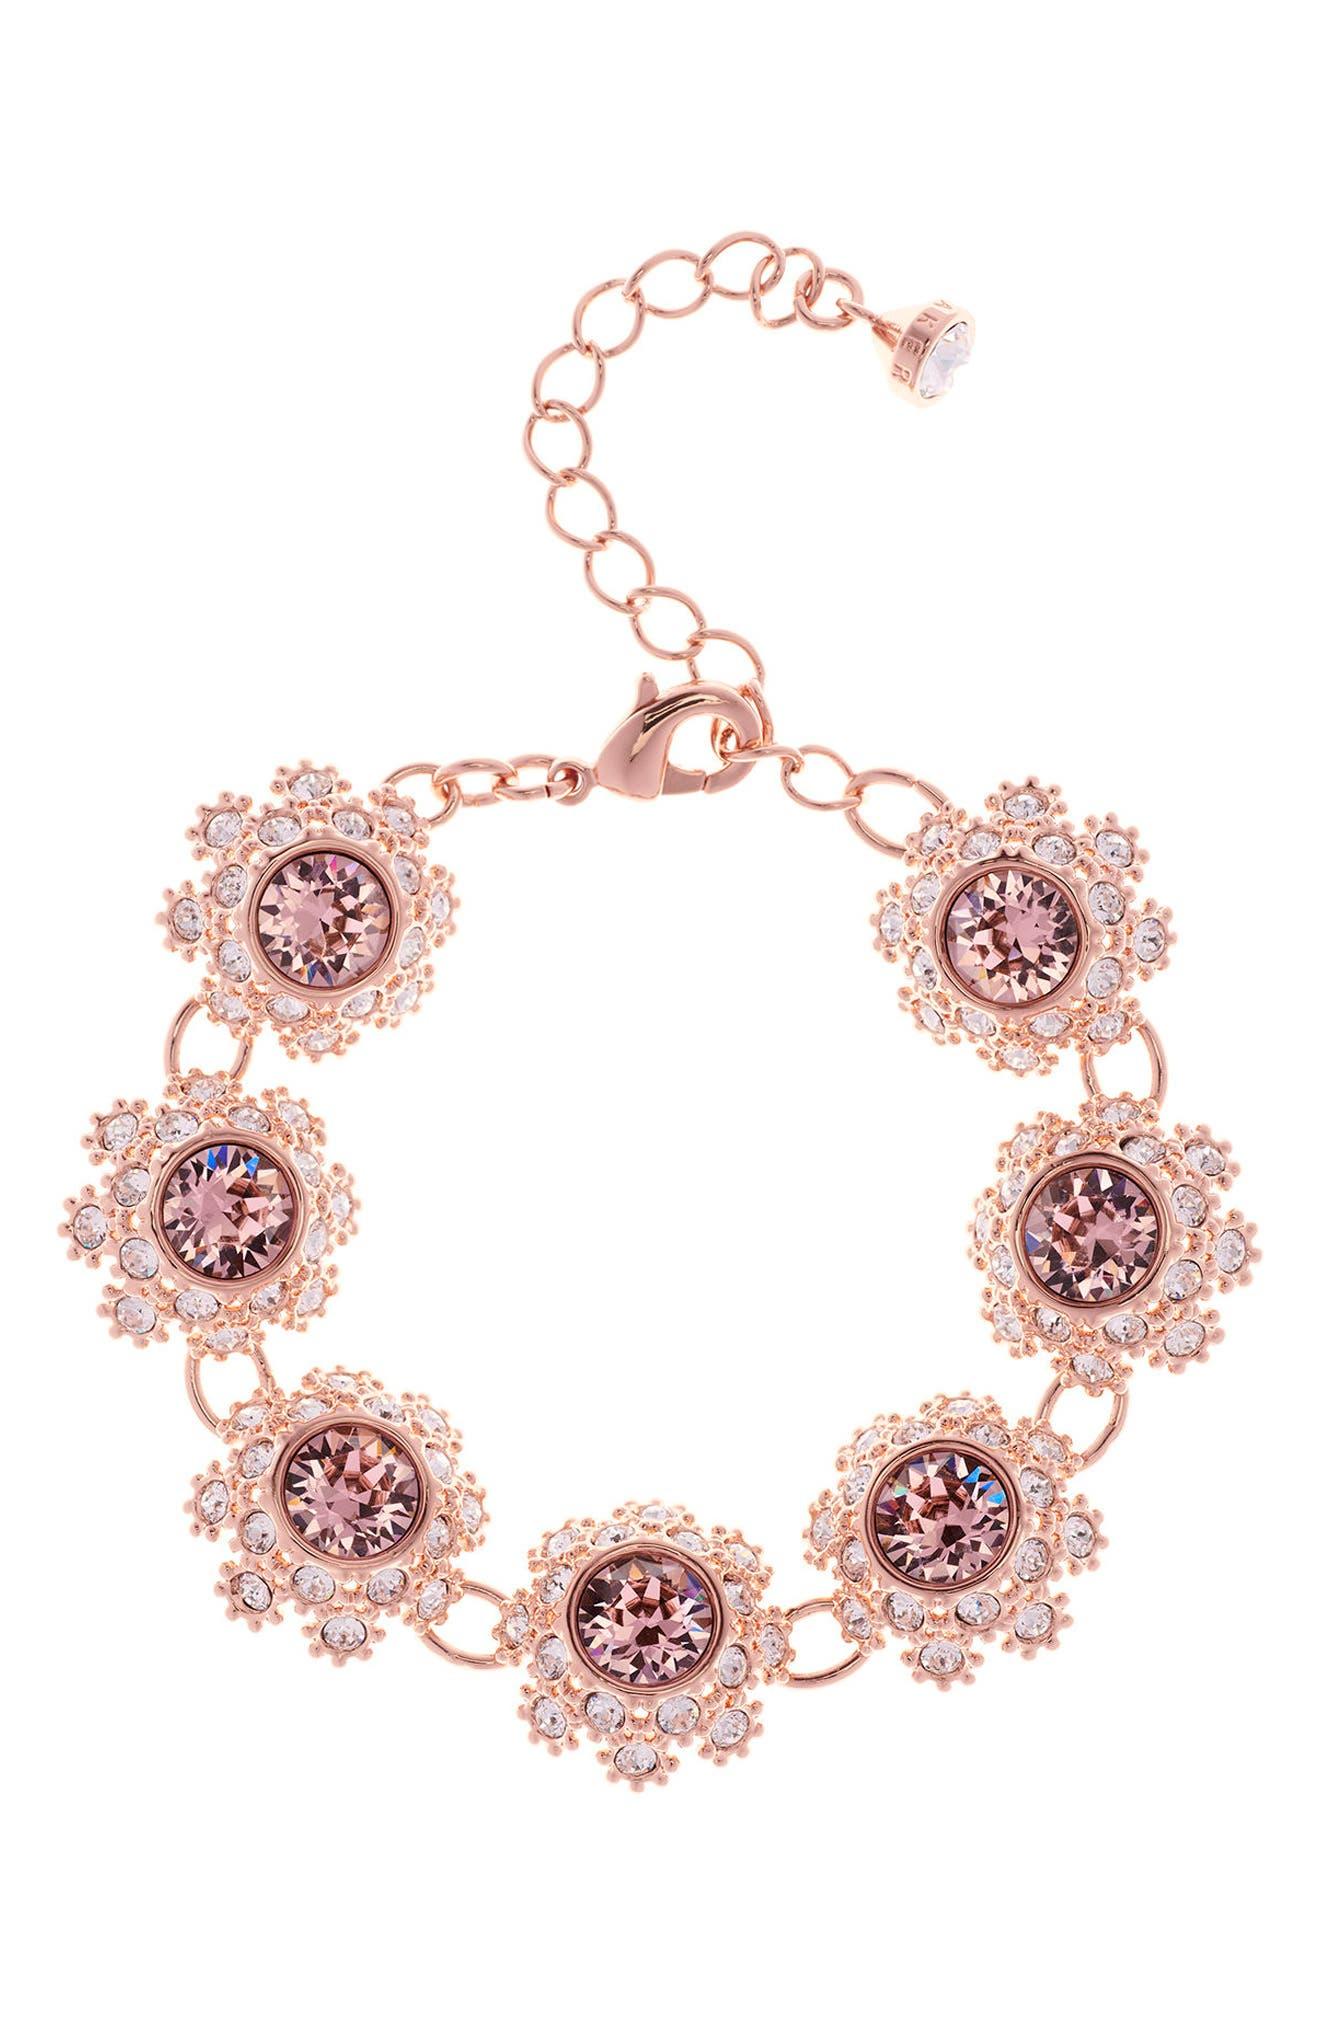 Main Image - Ted Baker London Crystal Daisy Lace Station Bracelet